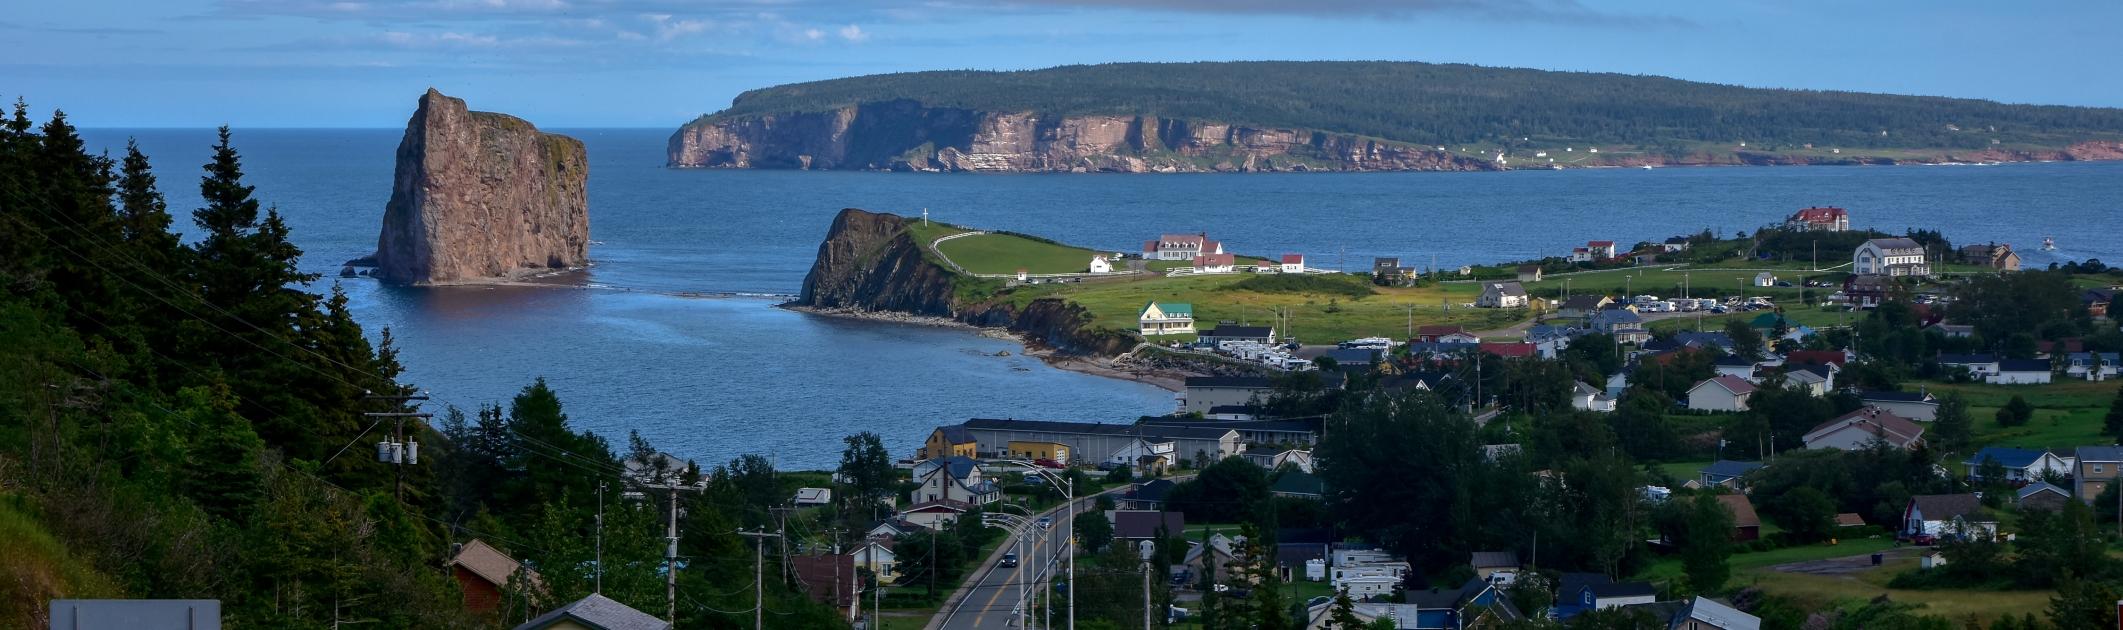 Gaspésie/Iles-de-la-Madeleine